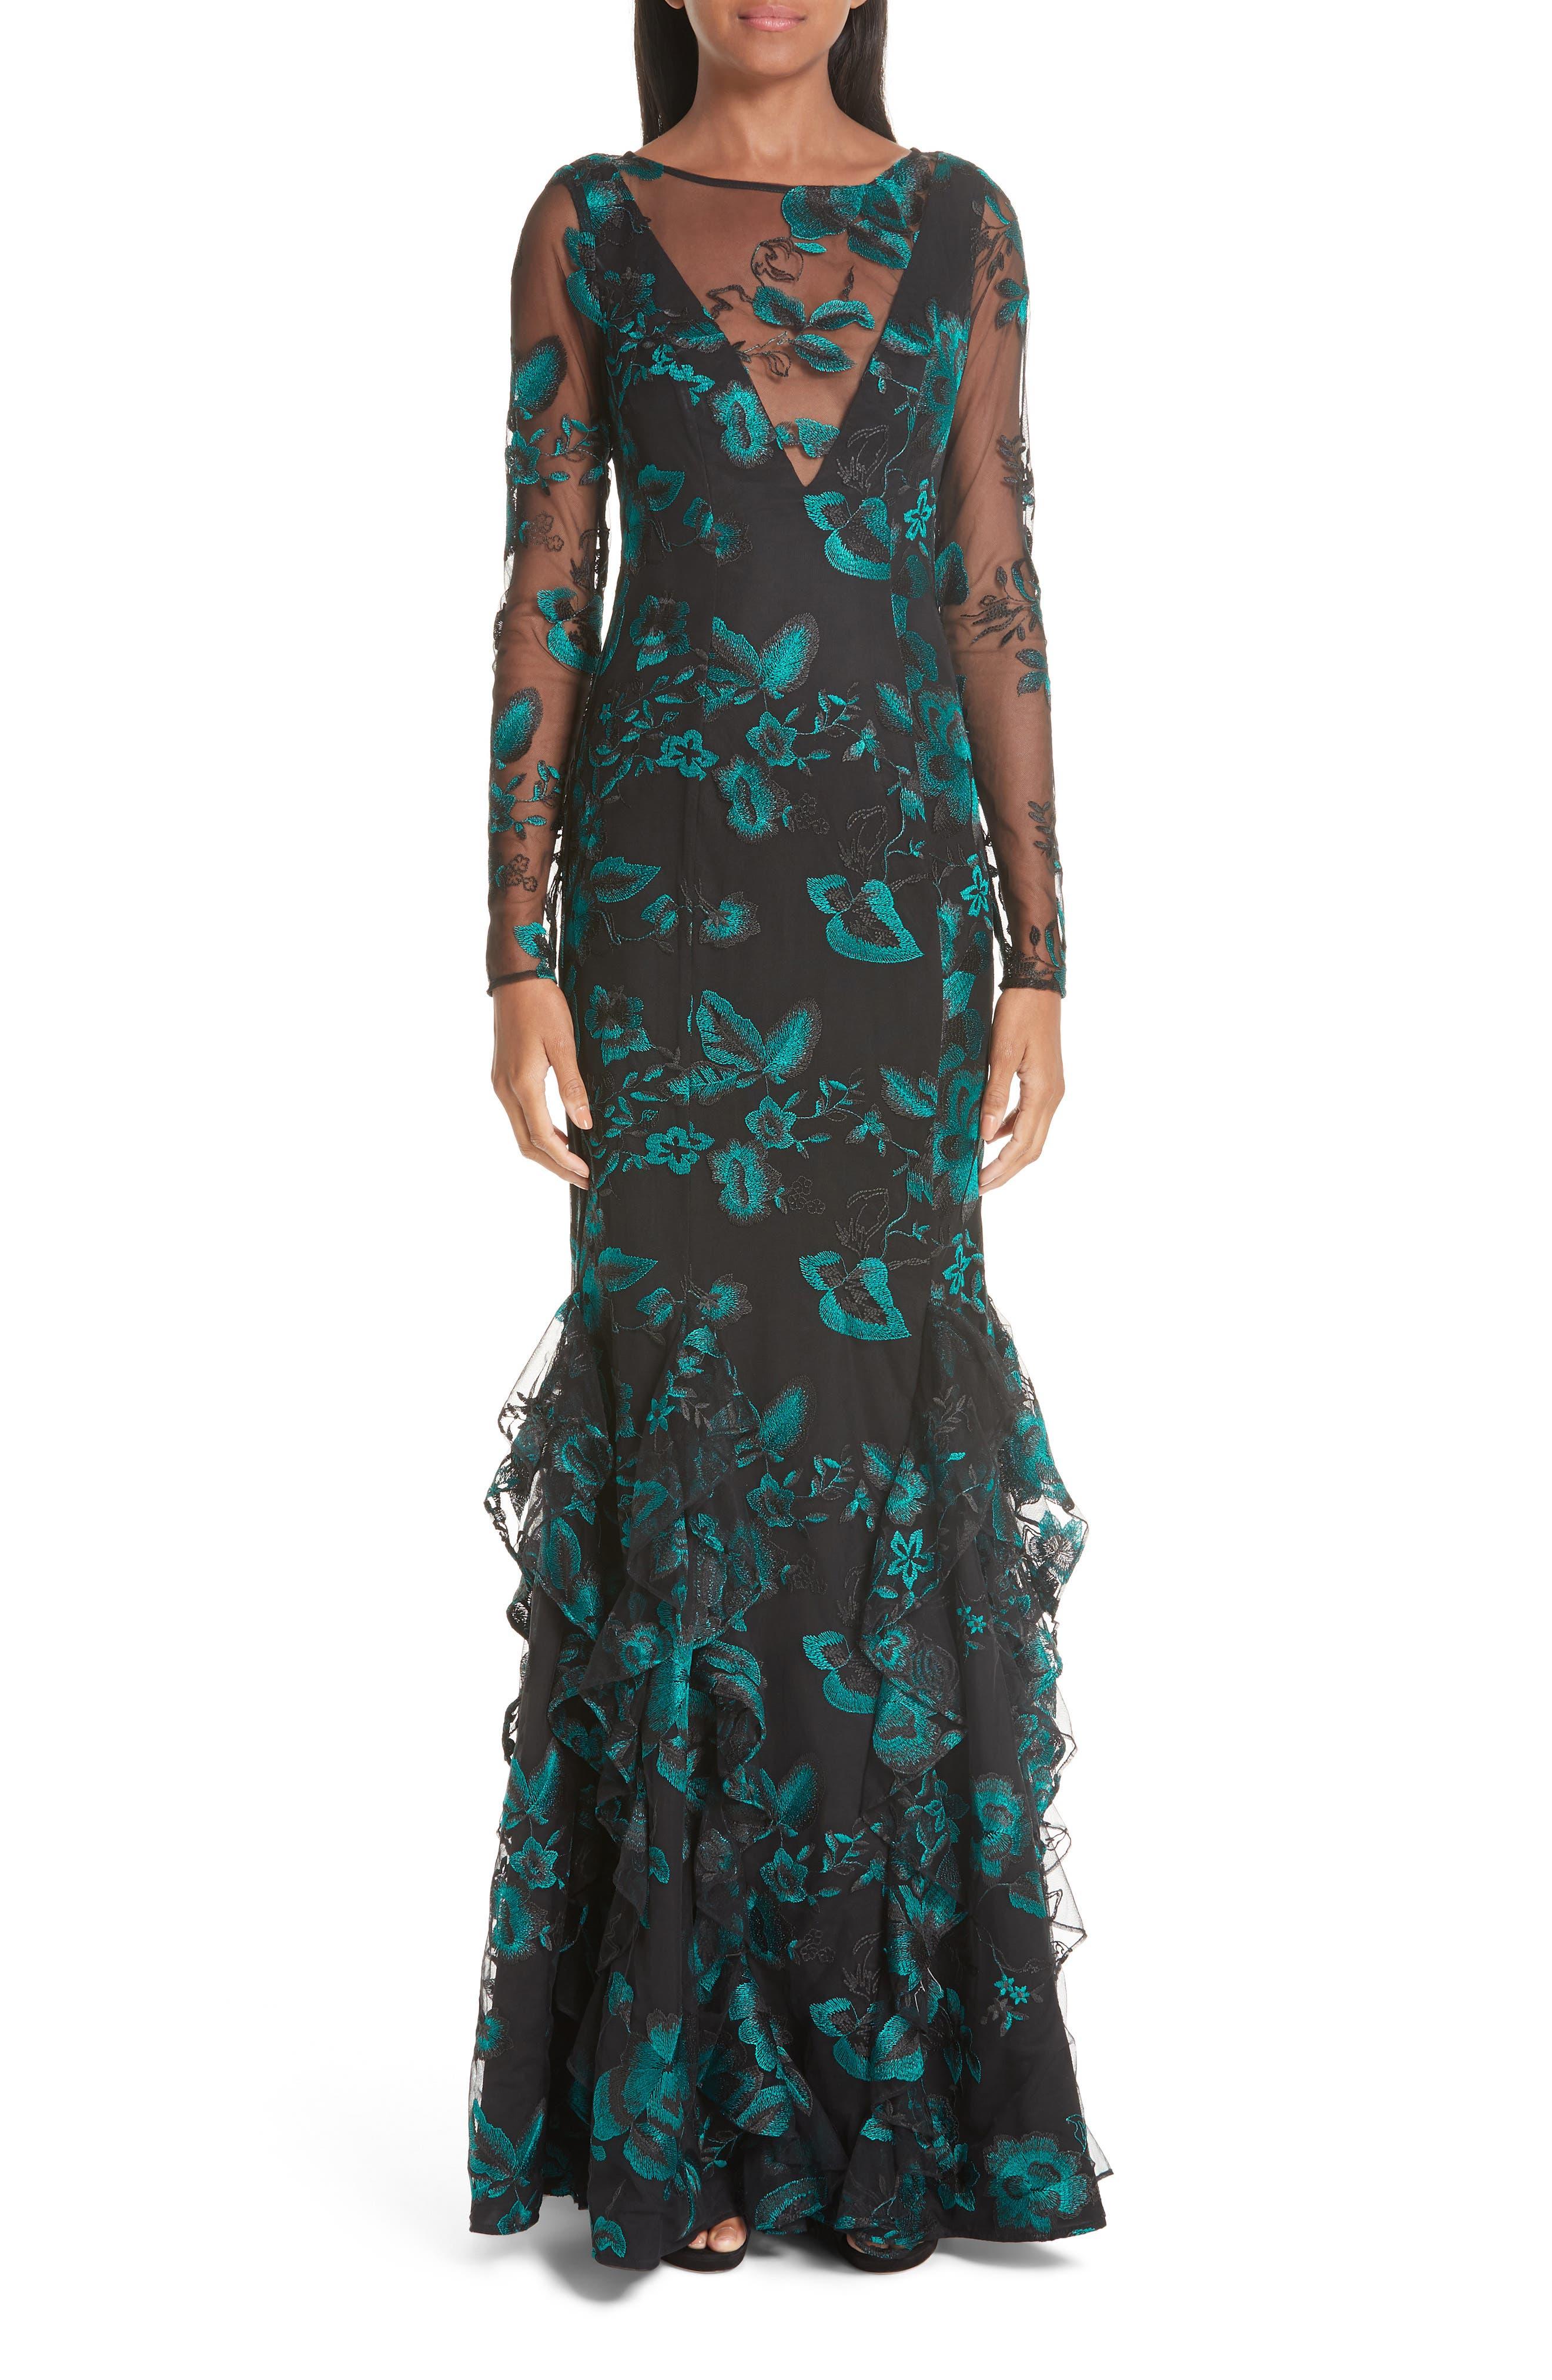 Zac Zac Posen Lindsay Print Ruffle Mesh Evening Dress